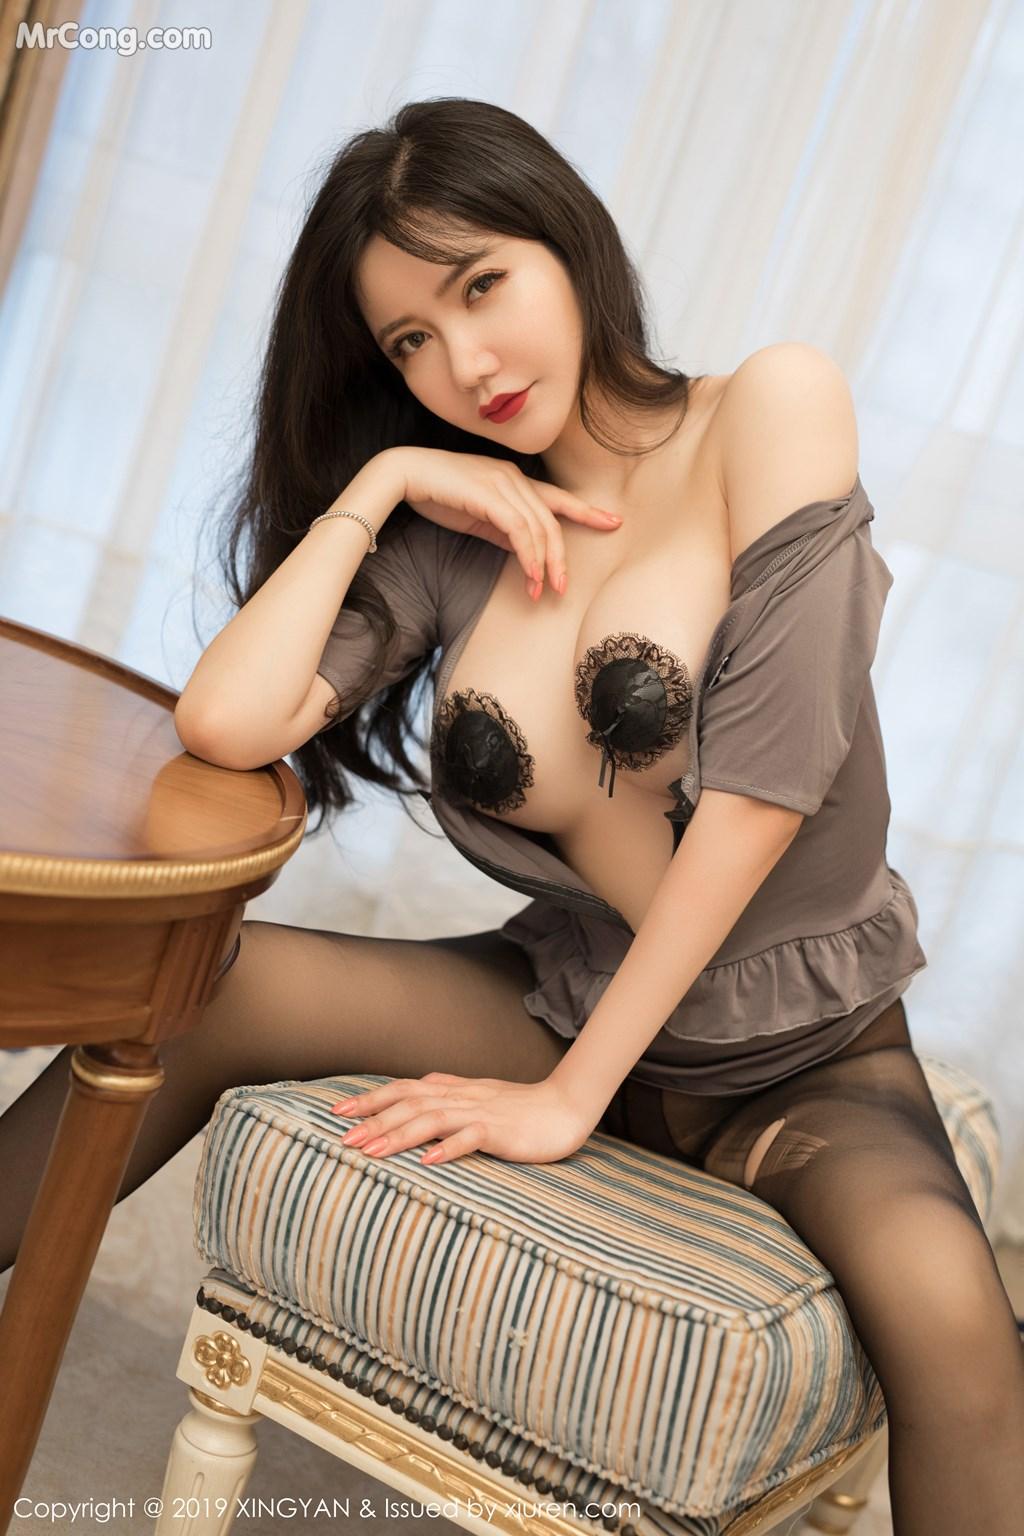 Image XingYan-Vol.123-MrCong.com-022 in post XingYan Vol.123: 心妍小公主 (47 ảnh)